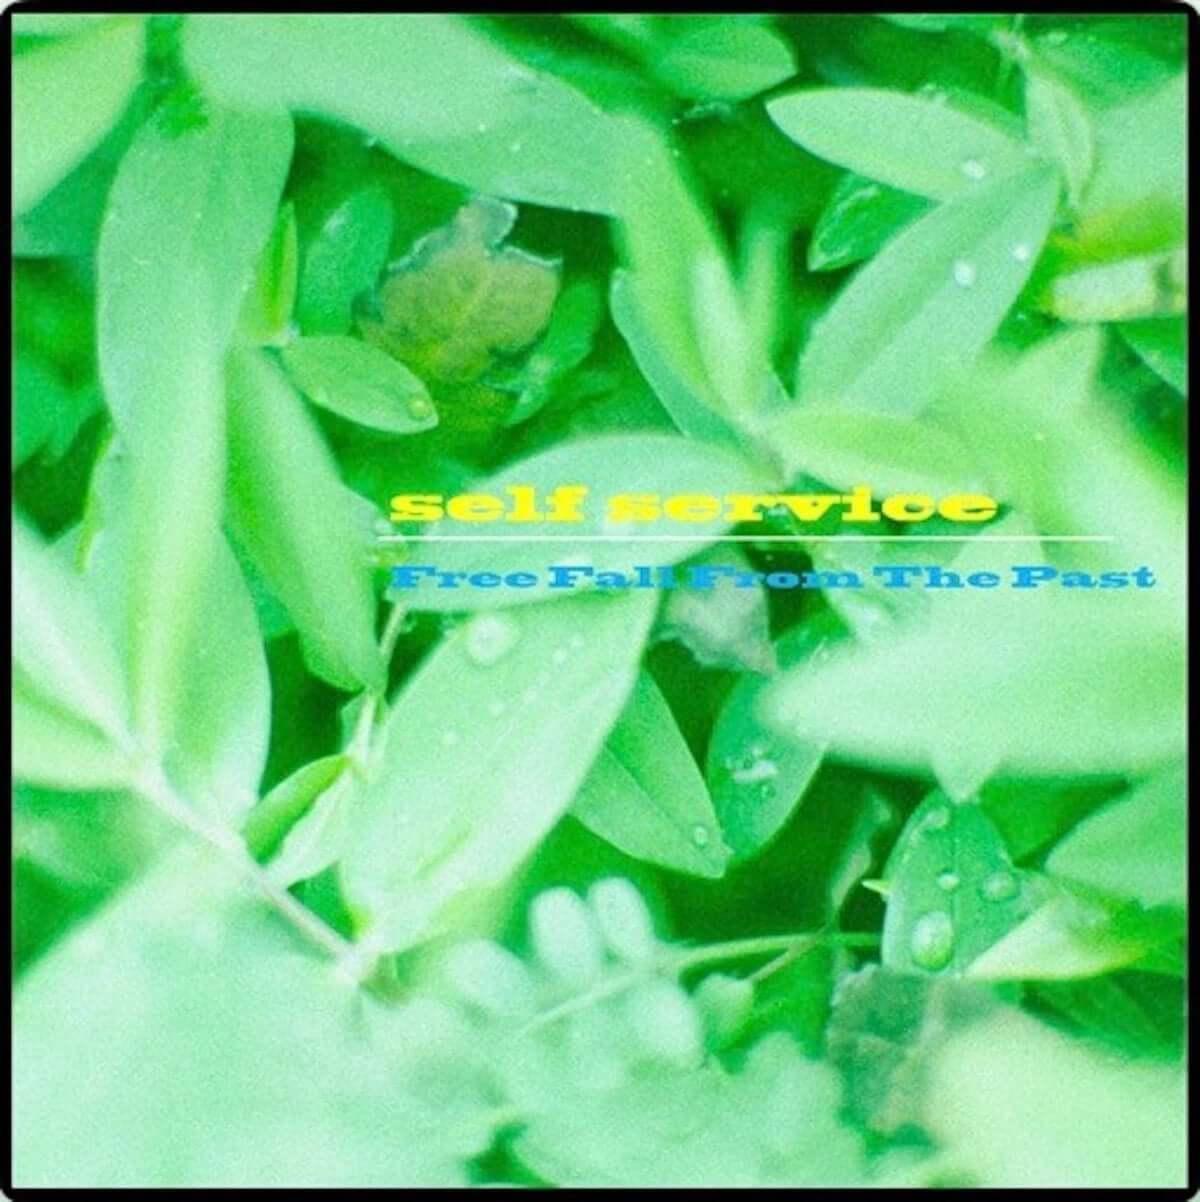 Ano(t)raksのDai OgasawaraによるインターネットのIndie Pop 最新7選 anotracks190121-indie-pop-6-1200x1202